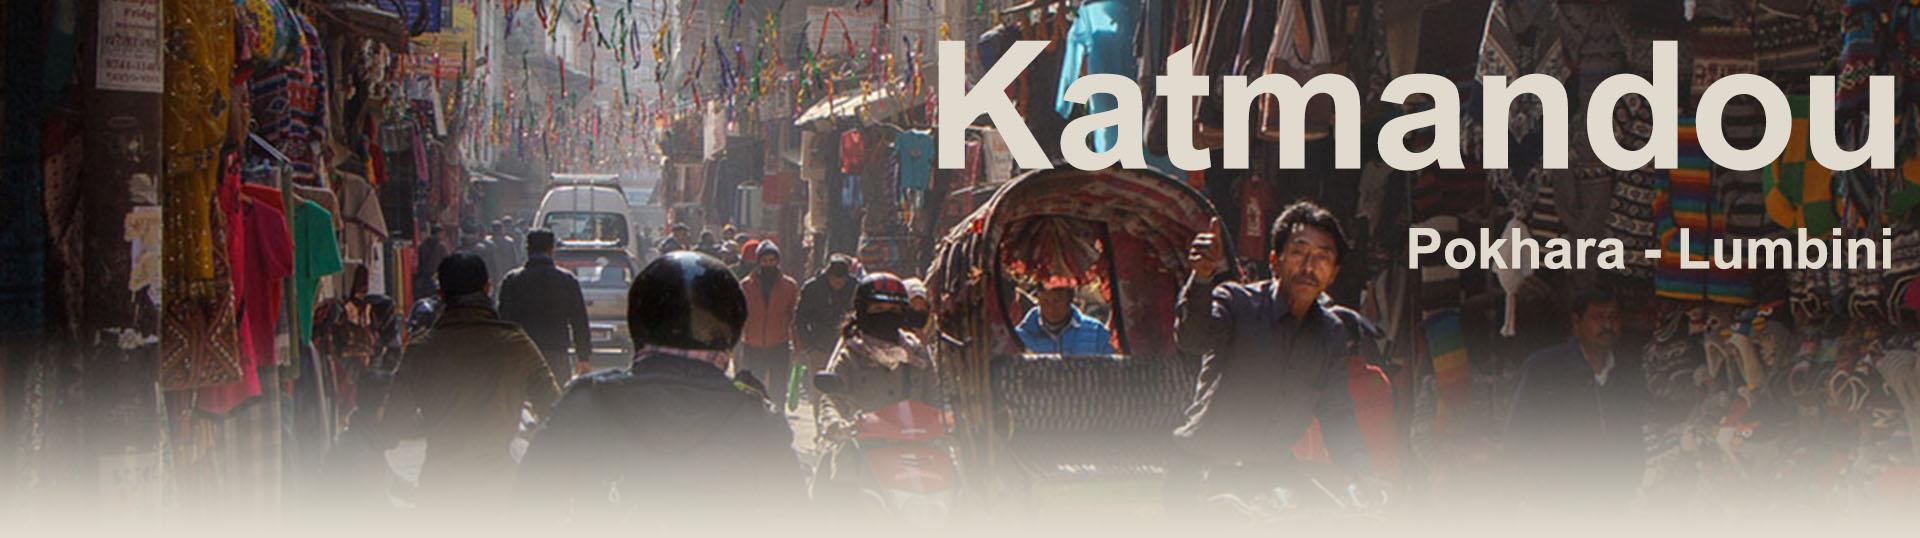 Katmandou Phokhara Lumbini tour